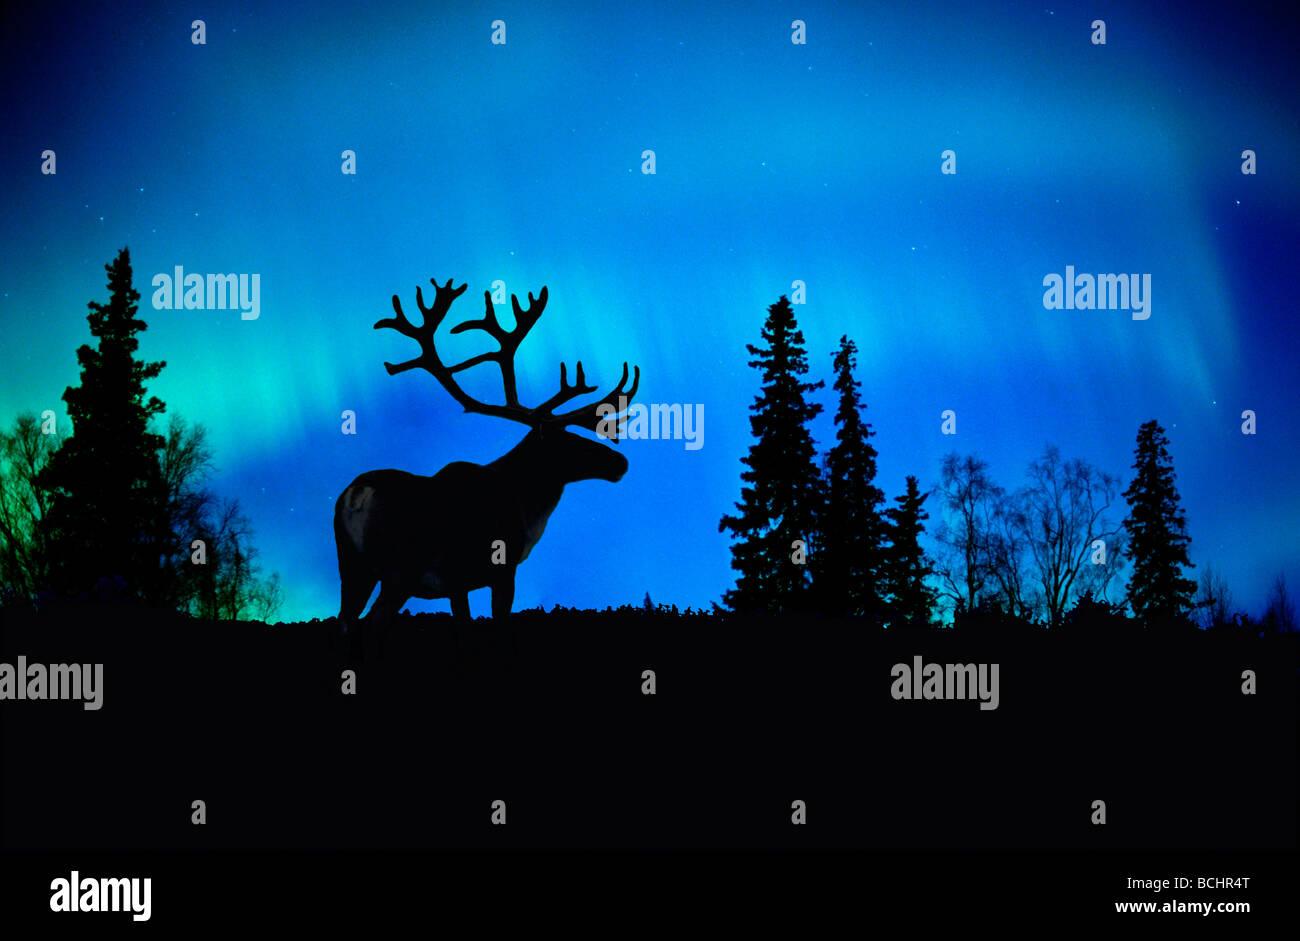 animal live wallpaper